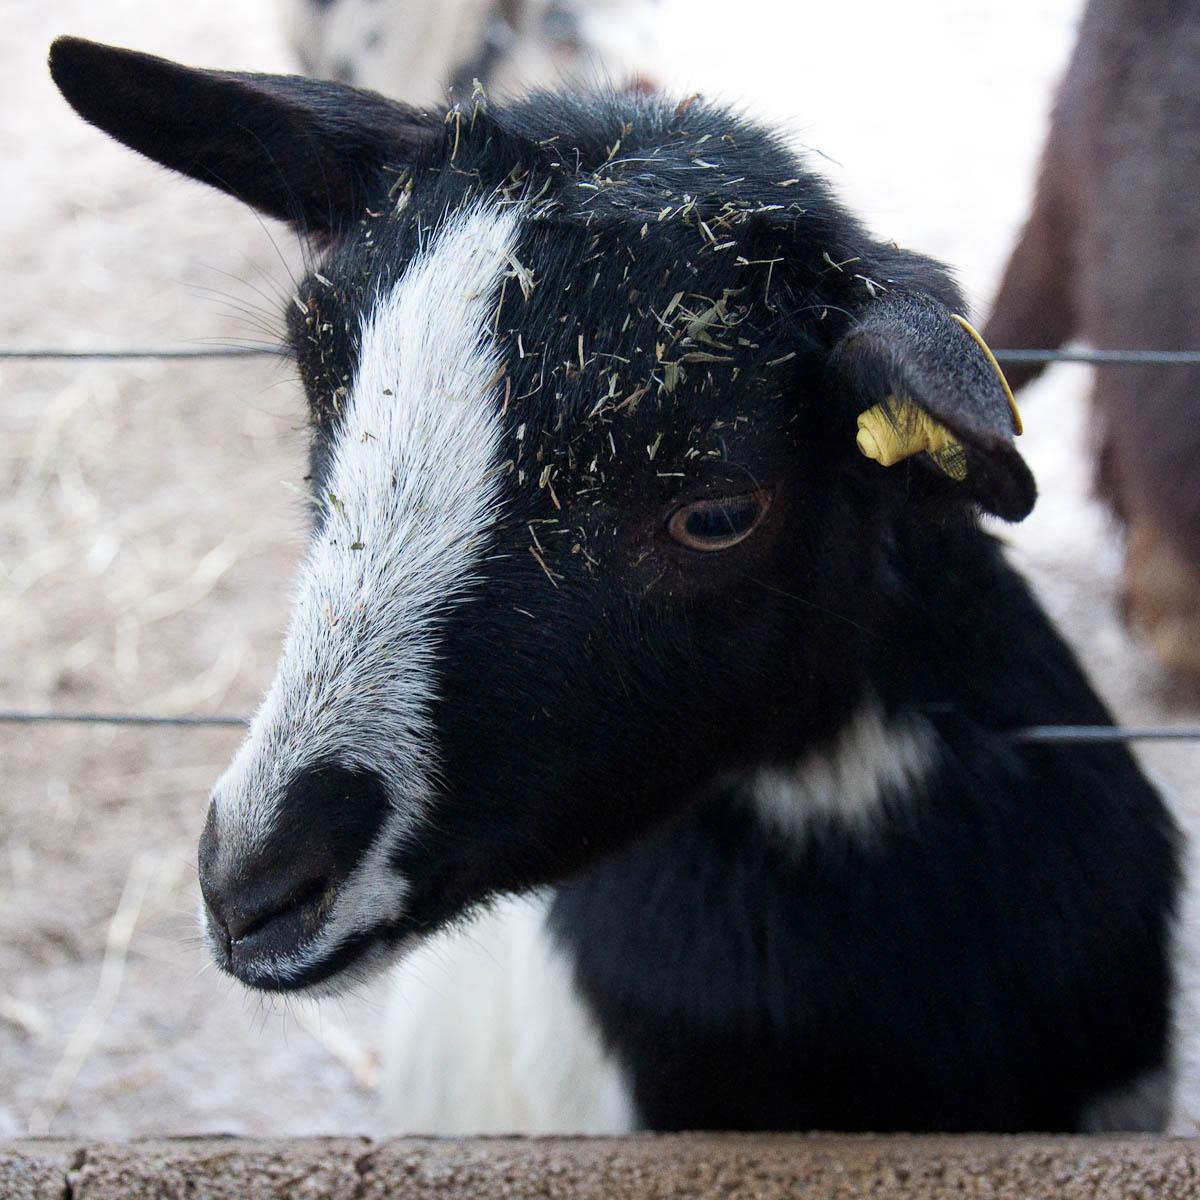 Curious goat, Parco Faunistico Cappeller, Nove, Veneto, Italy